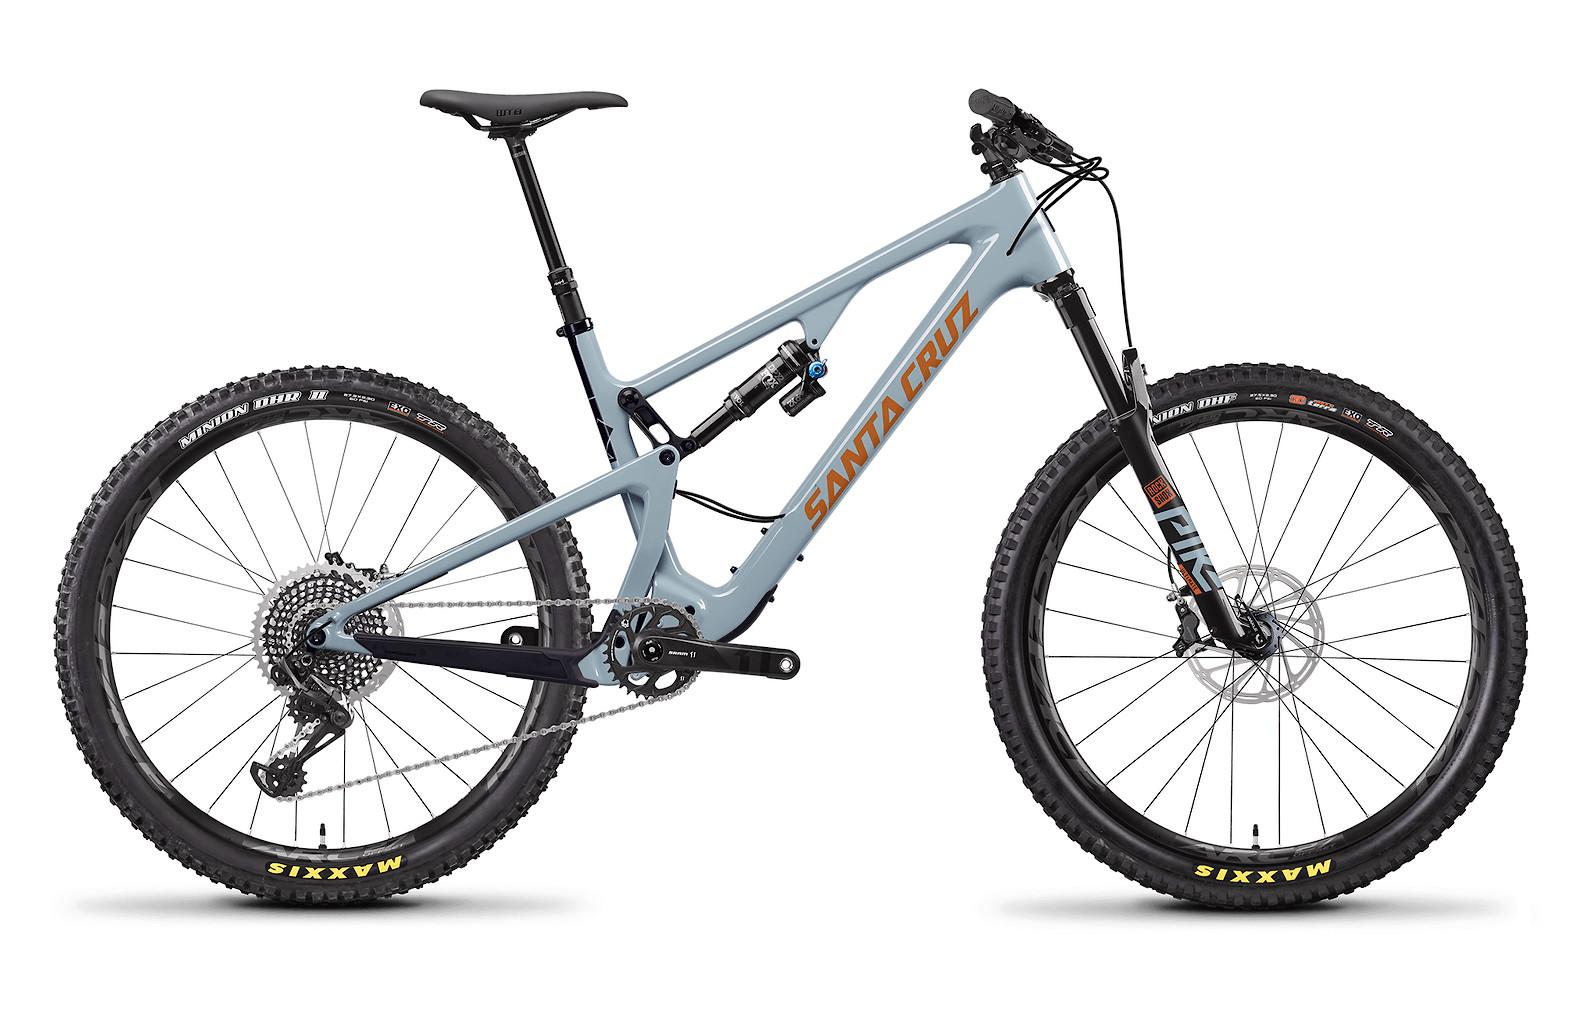 2020 Santa Cruz 5010 Carbon CC X01 (Regular Build, Robins Egg and Orange)